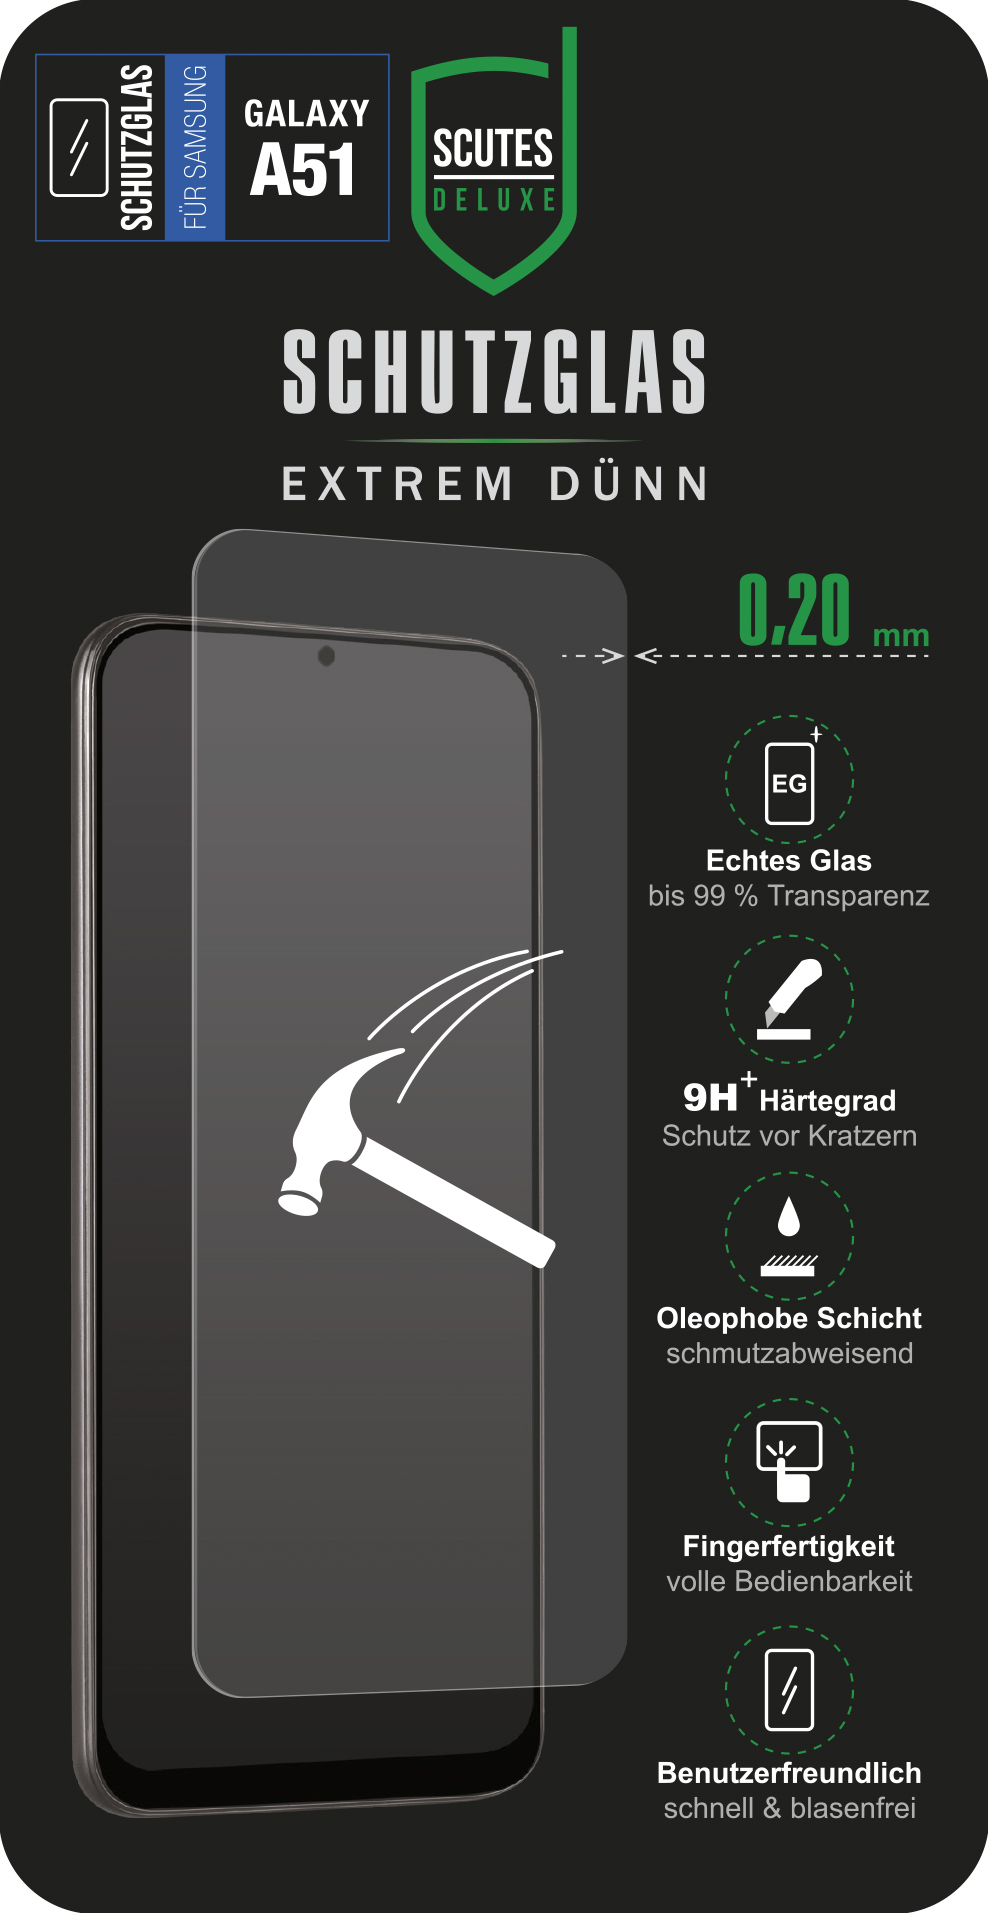 Schutzglas 0,20 (Samsung Galaxy A51)